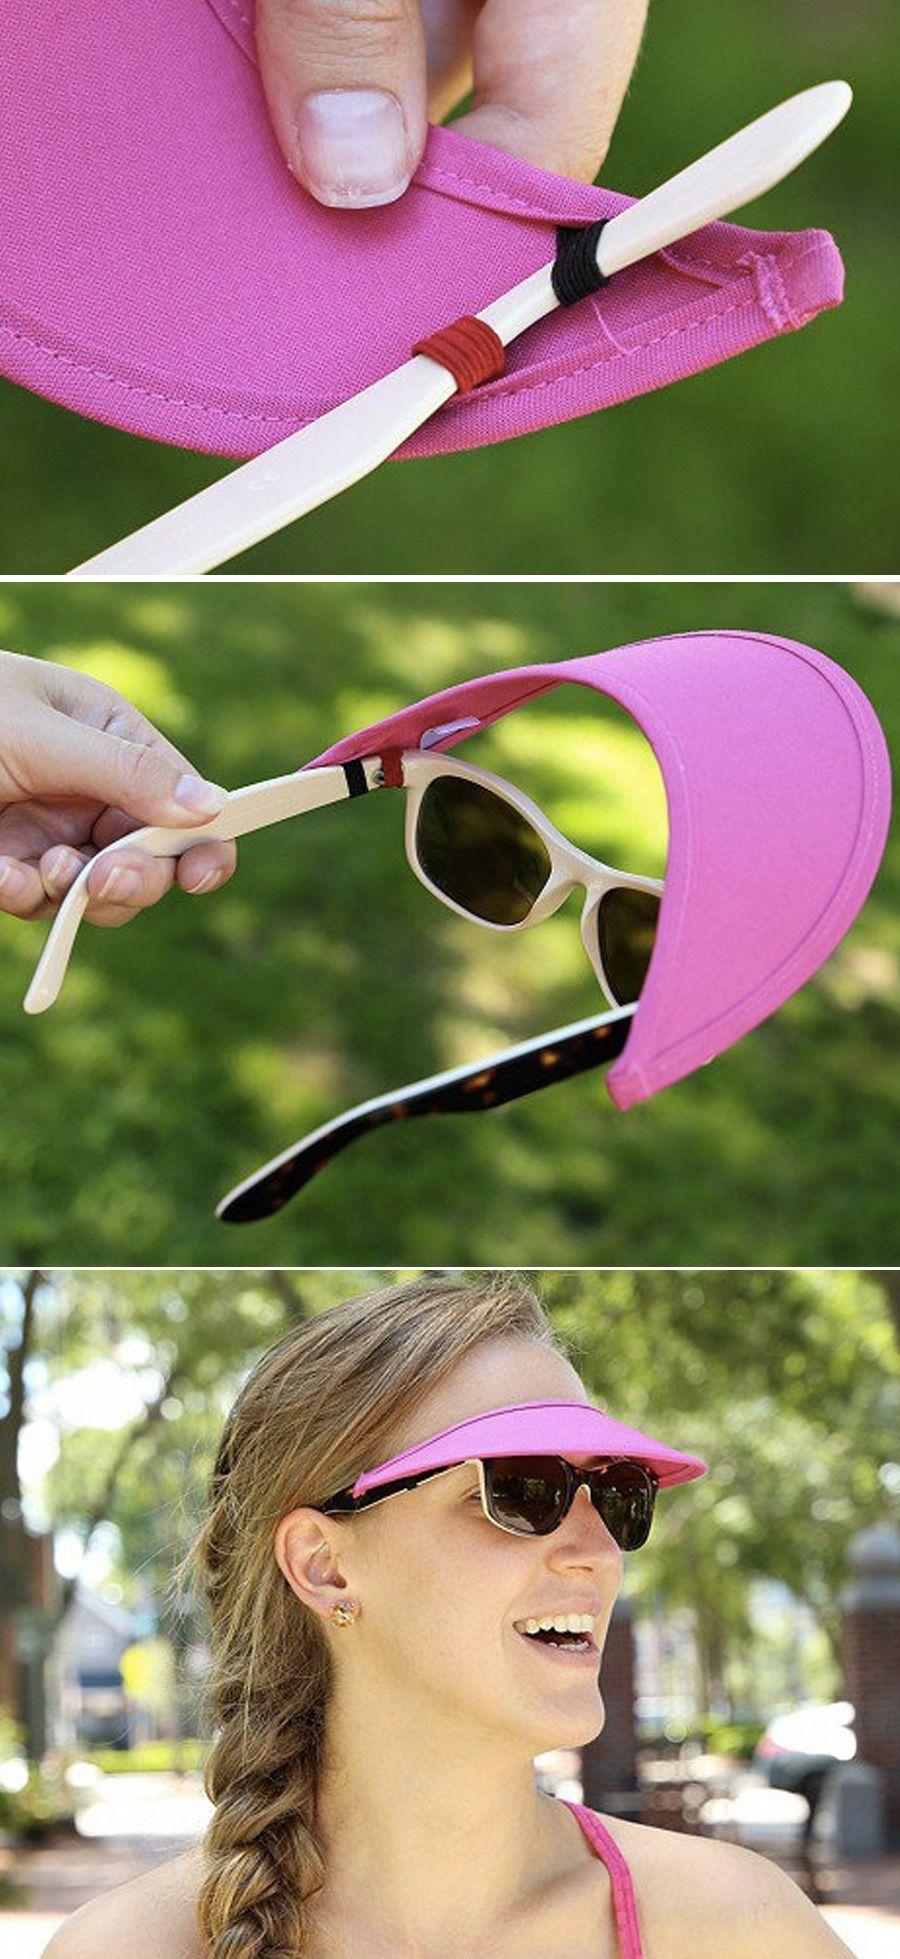 Vizini strapless visor has loops that slide onto the arms